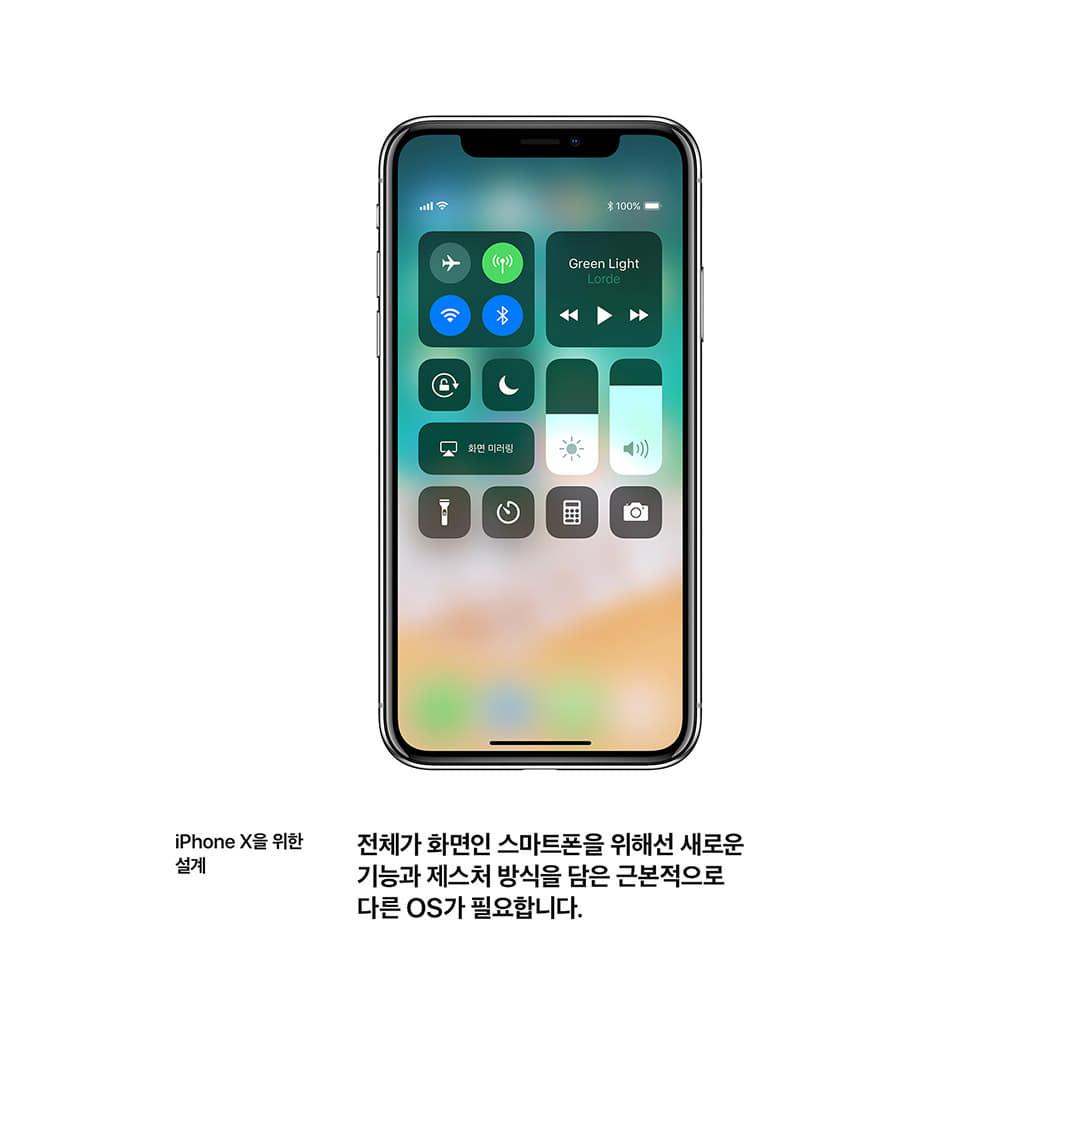 iPhoneX을 위한 설계 전체가 화면인 스마트폰을 위해선 새로운 기능과 제스처 방식을 담은 근본적으로 다른 os가 필요합니다.